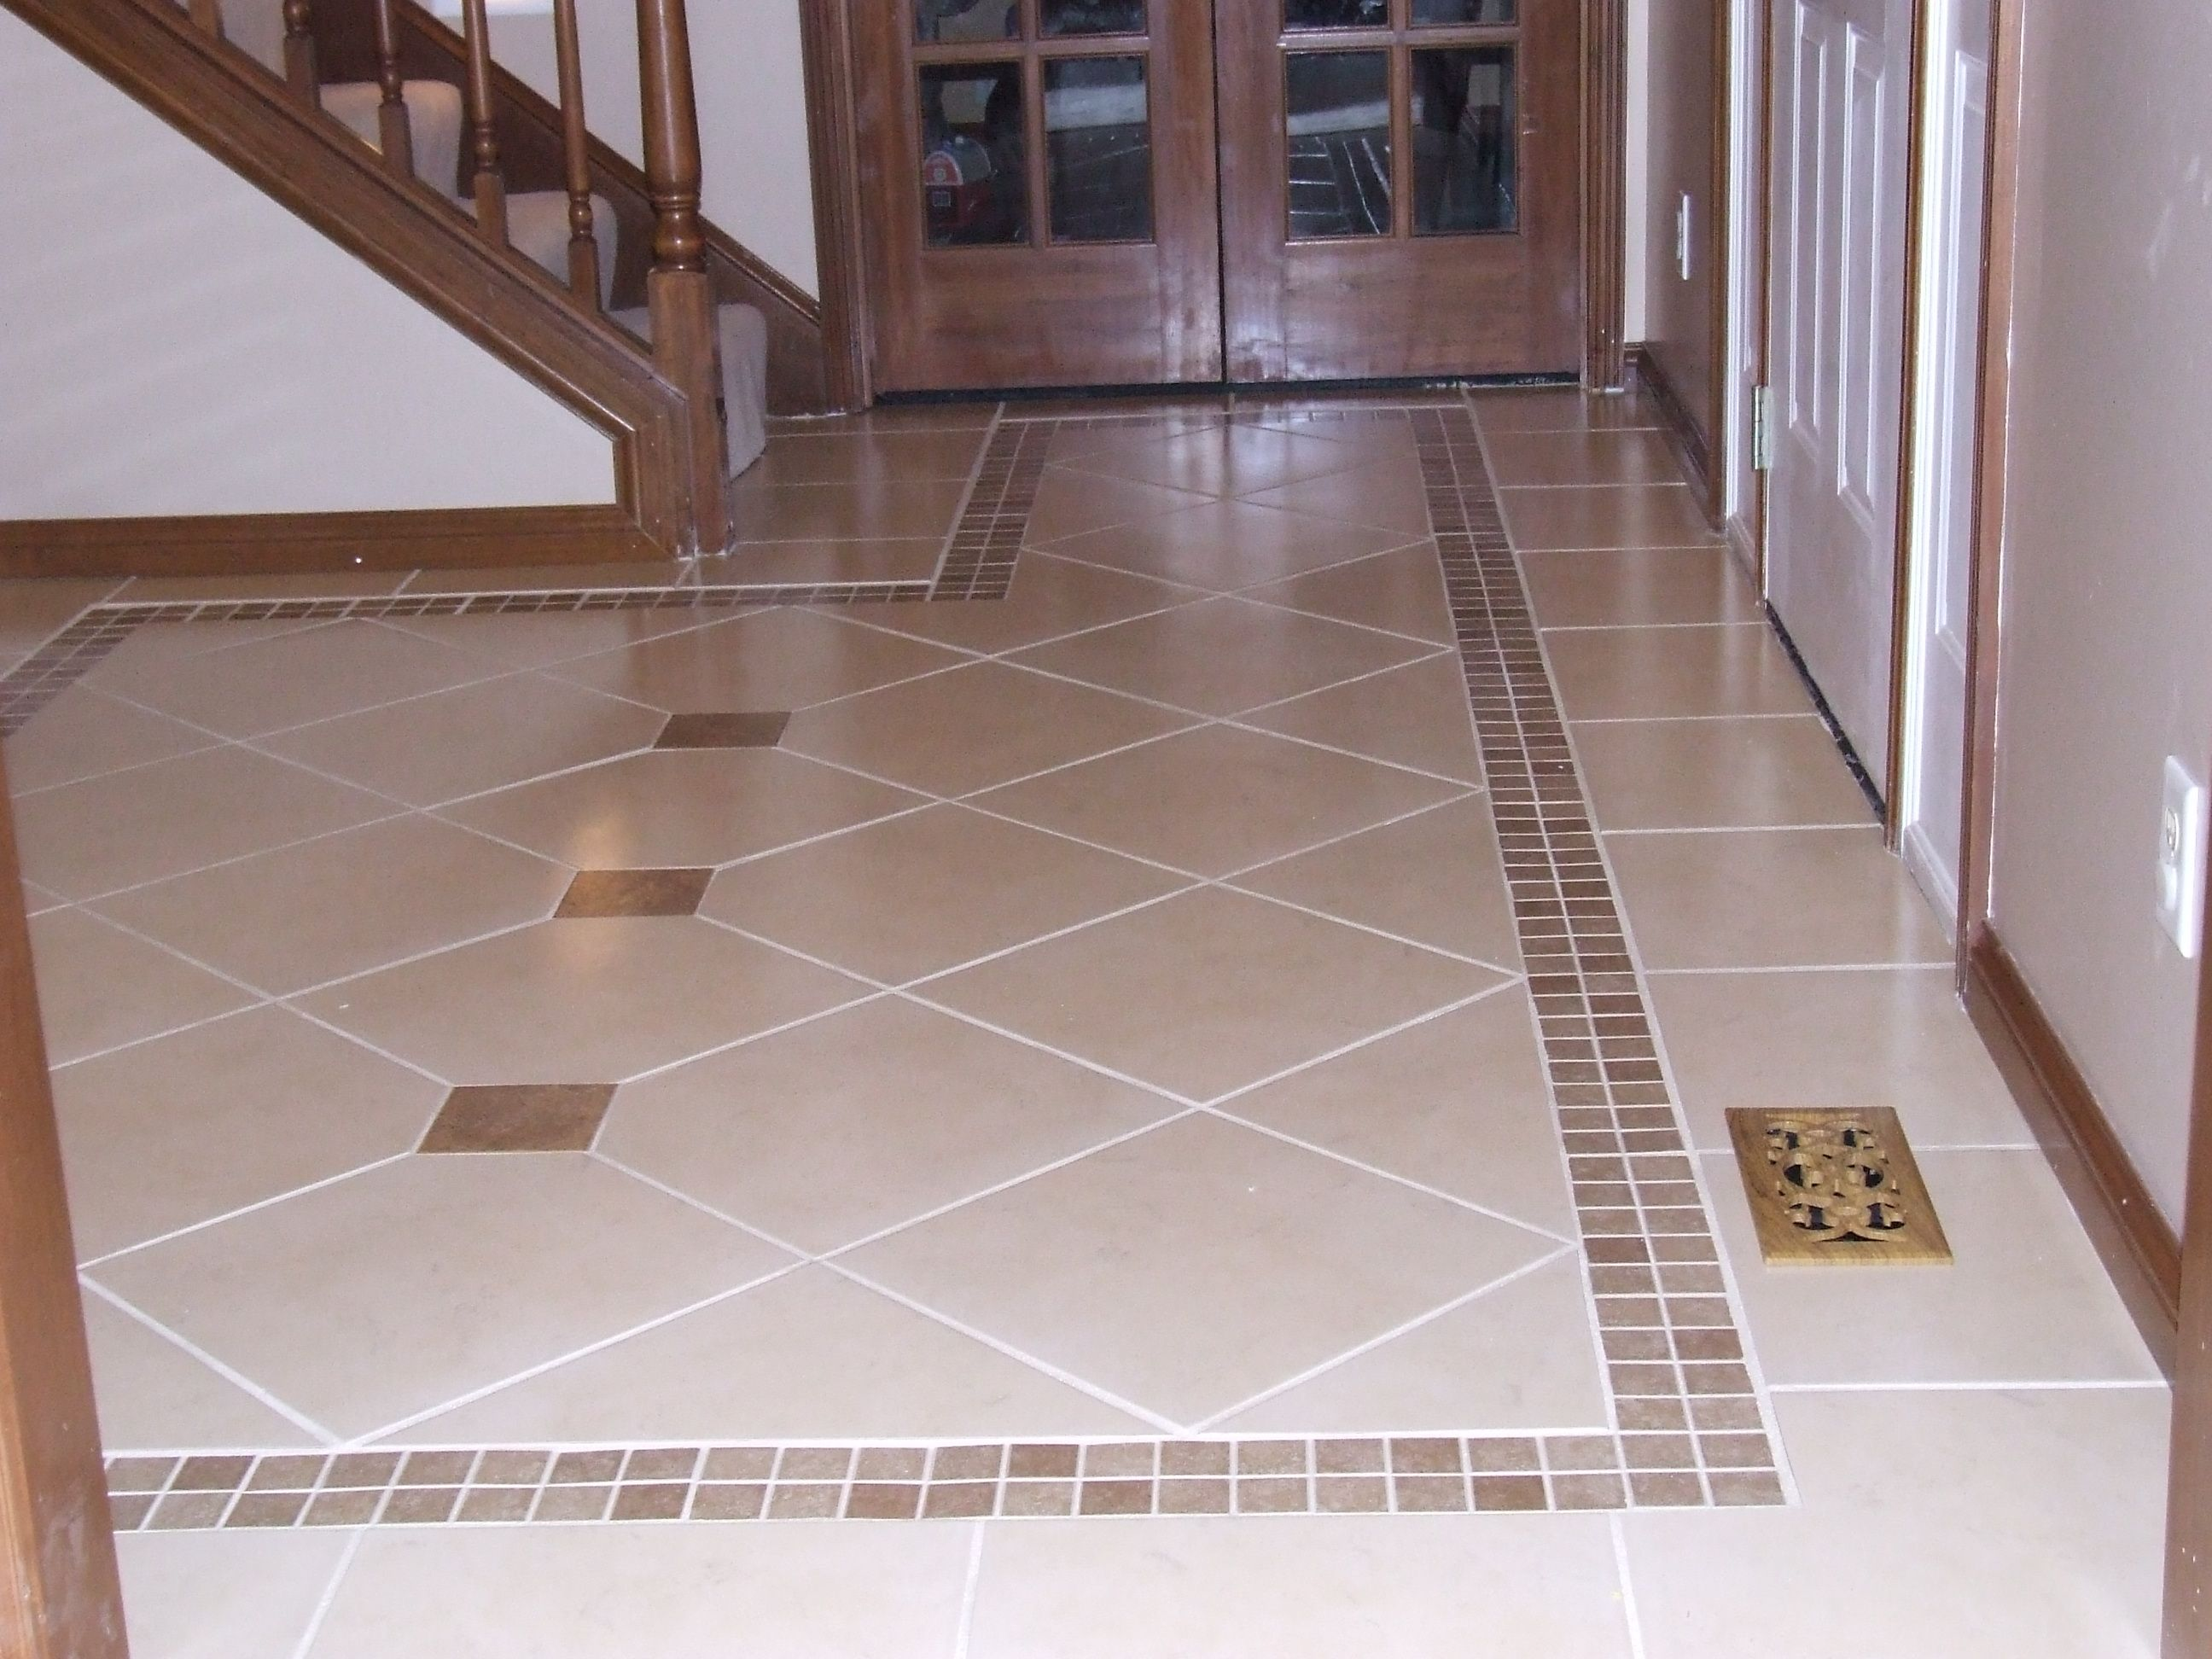 Kitchen Floor Tile Border Ideas Ceramic Tile Designs For